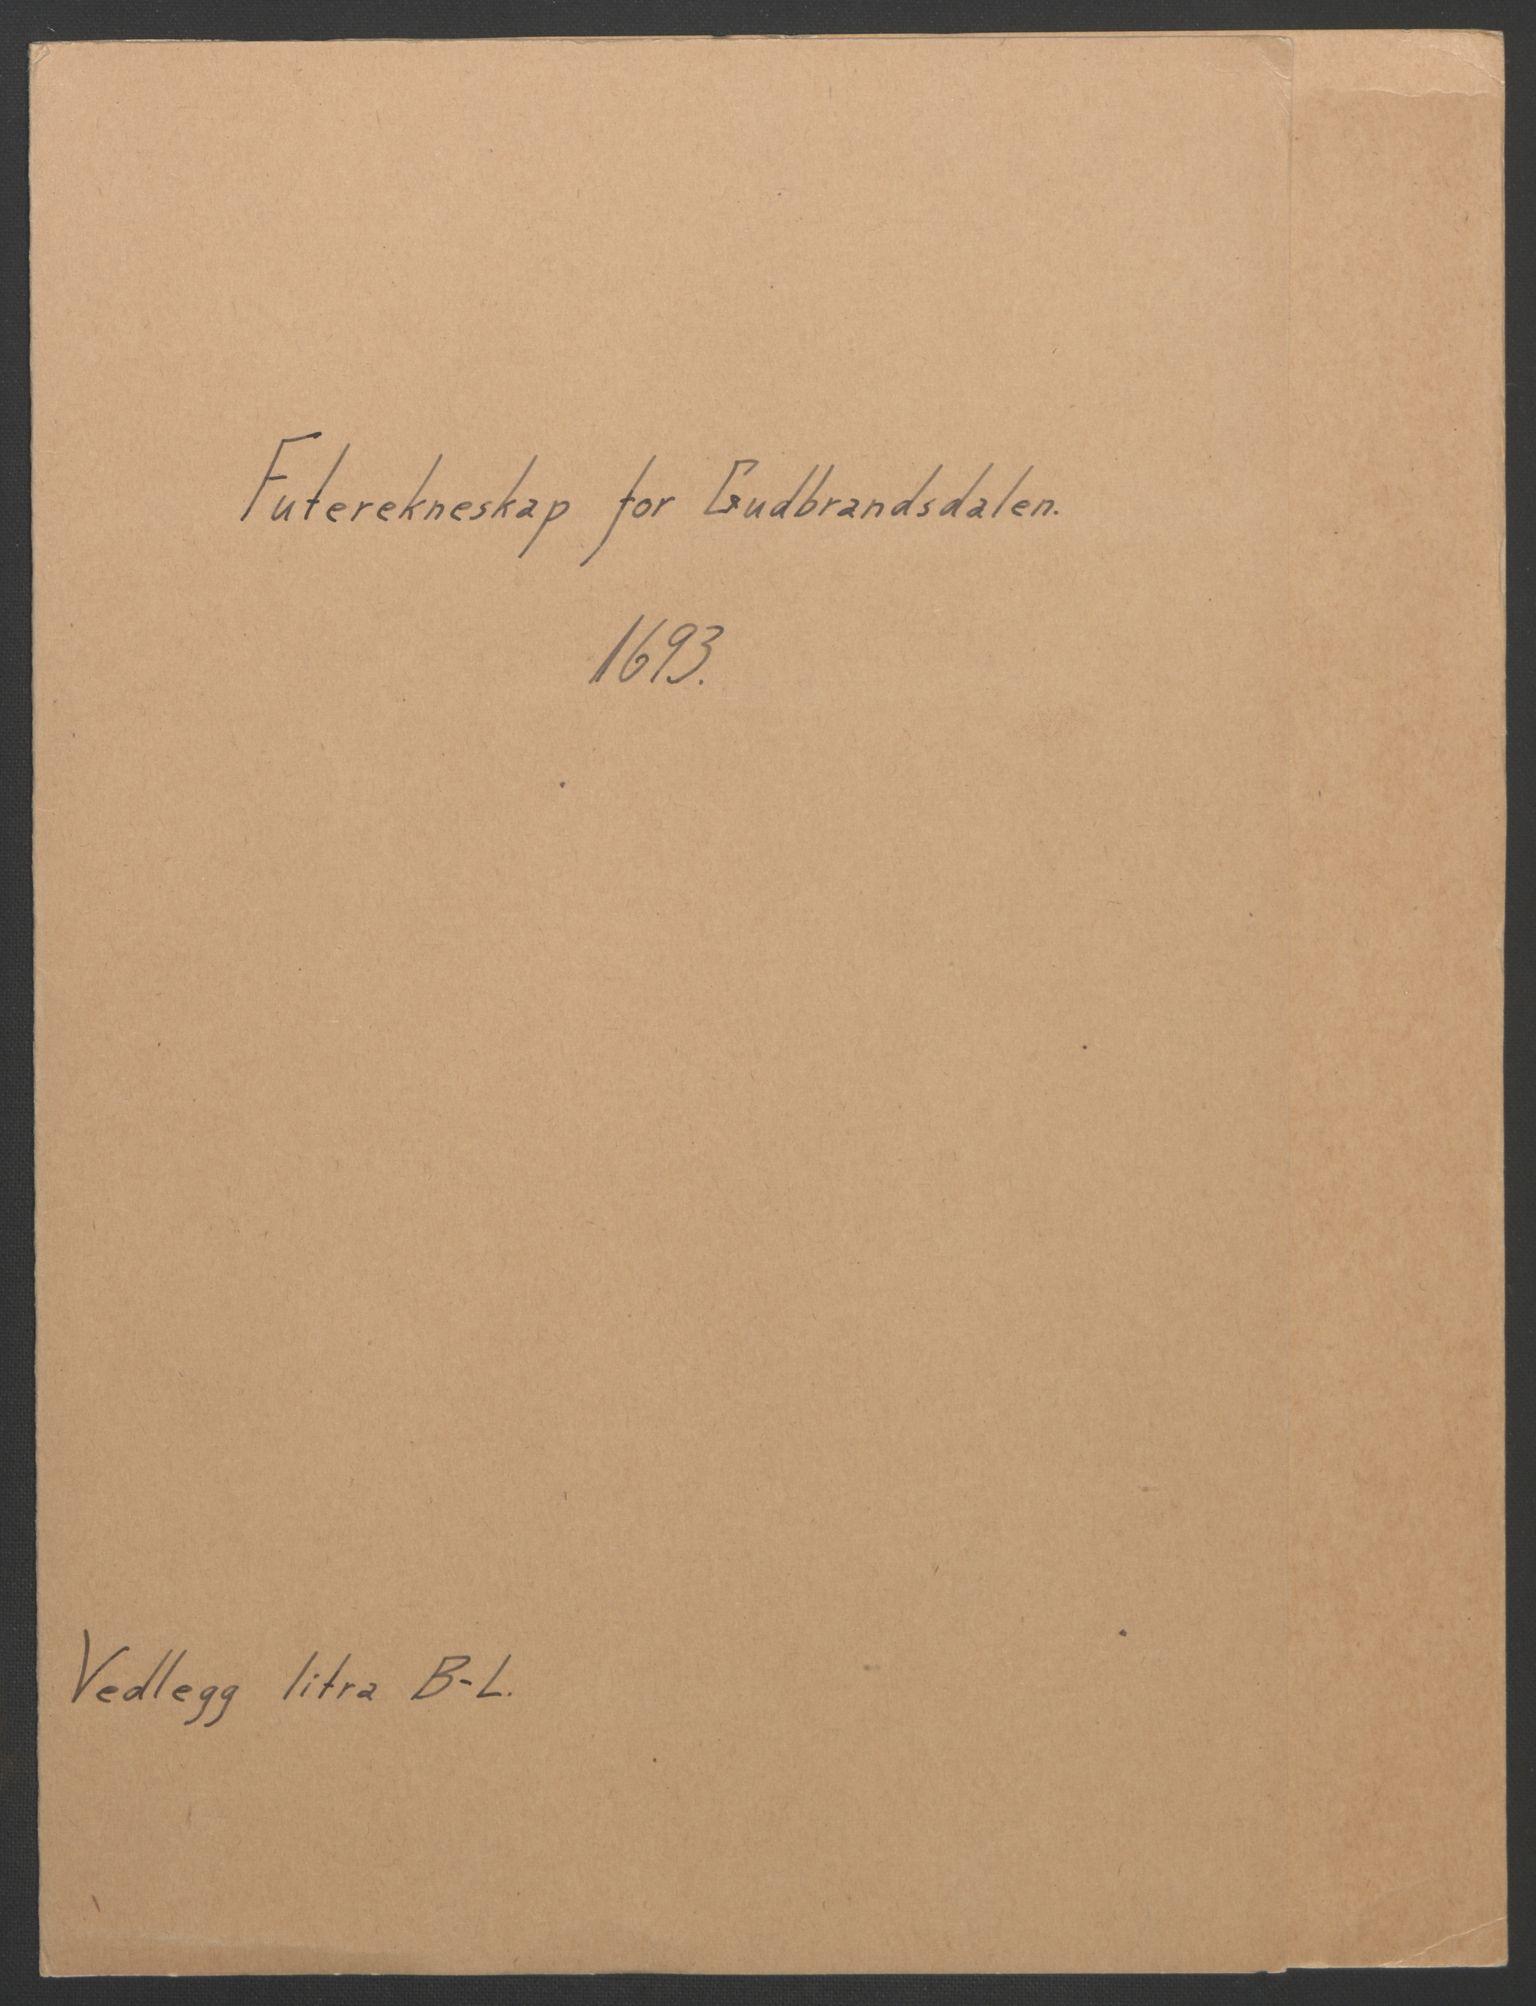 RA, Rentekammeret inntil 1814, Reviderte regnskaper, Fogderegnskap, R17/L1167: Fogderegnskap Gudbrandsdal, 1693, s. 219